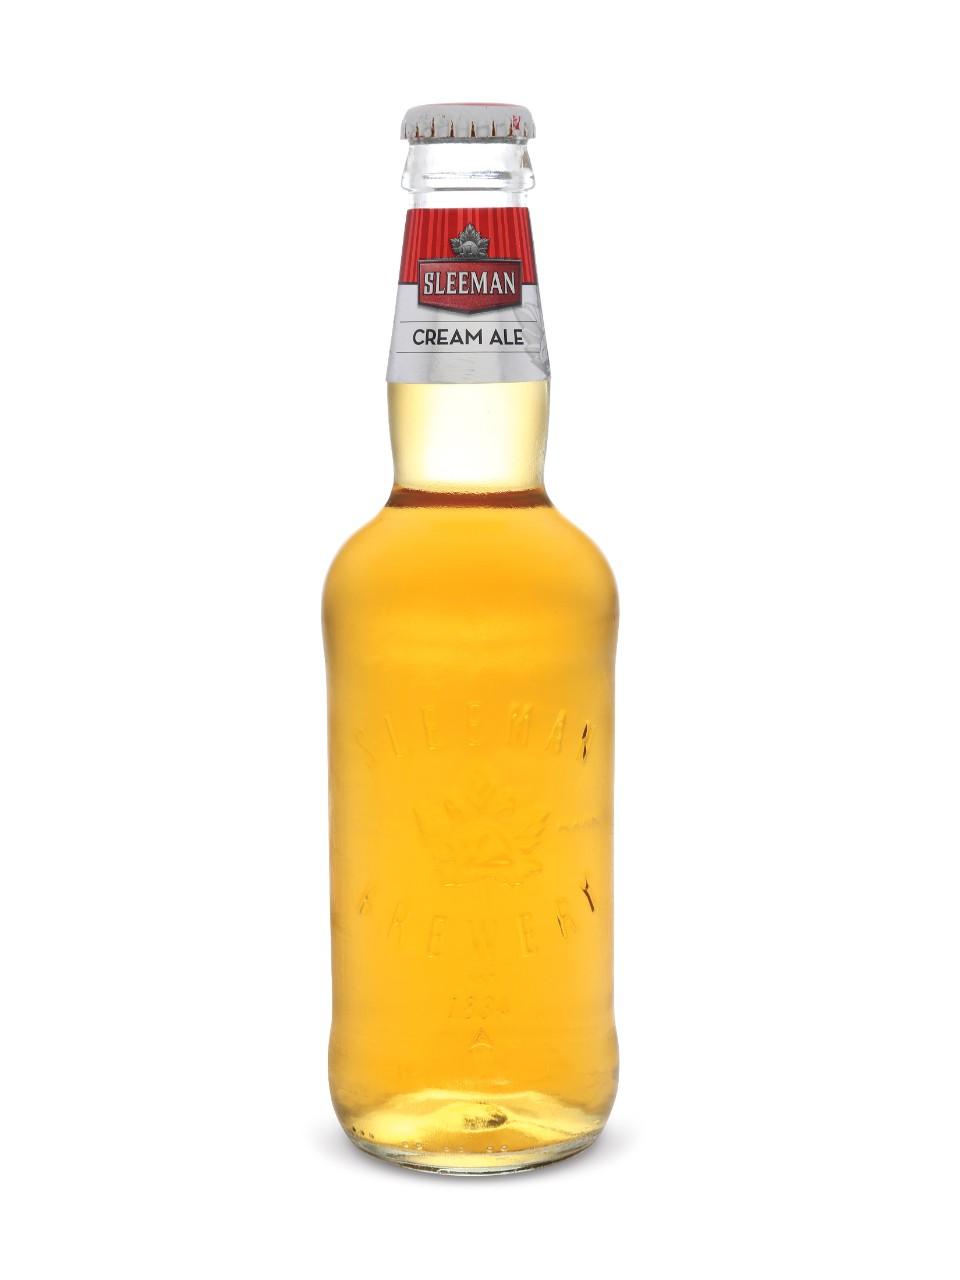 Bière Sleeman Cream Ale